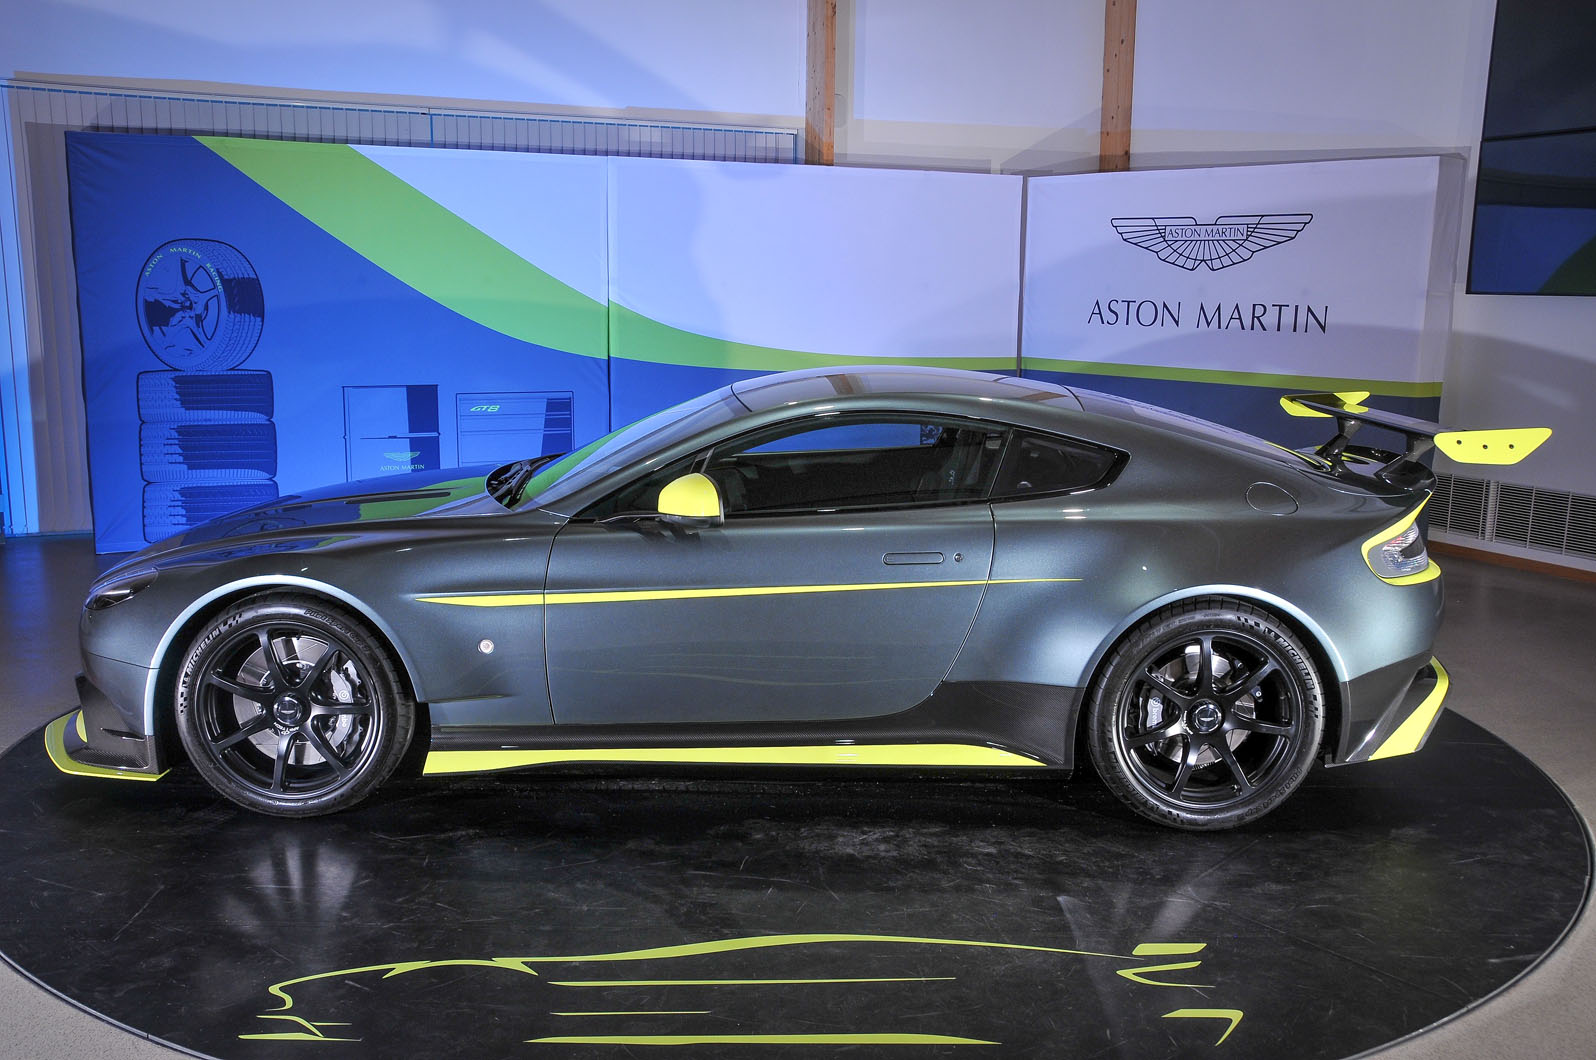 Aston Martin Vantage Gt8 Revealed Autocar